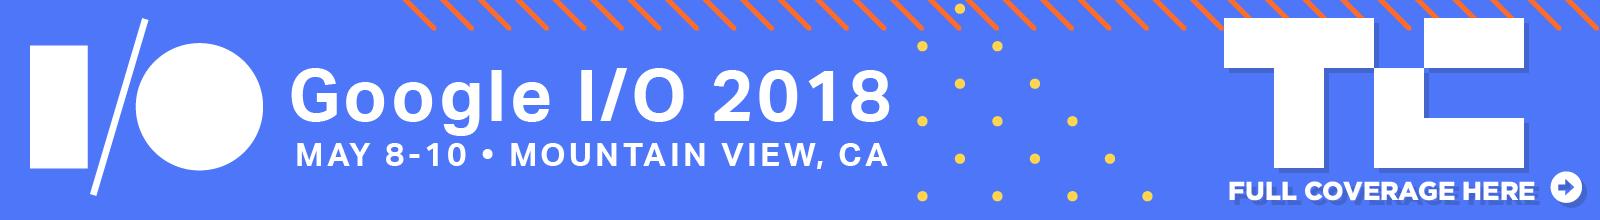 google io 2018 banner 4